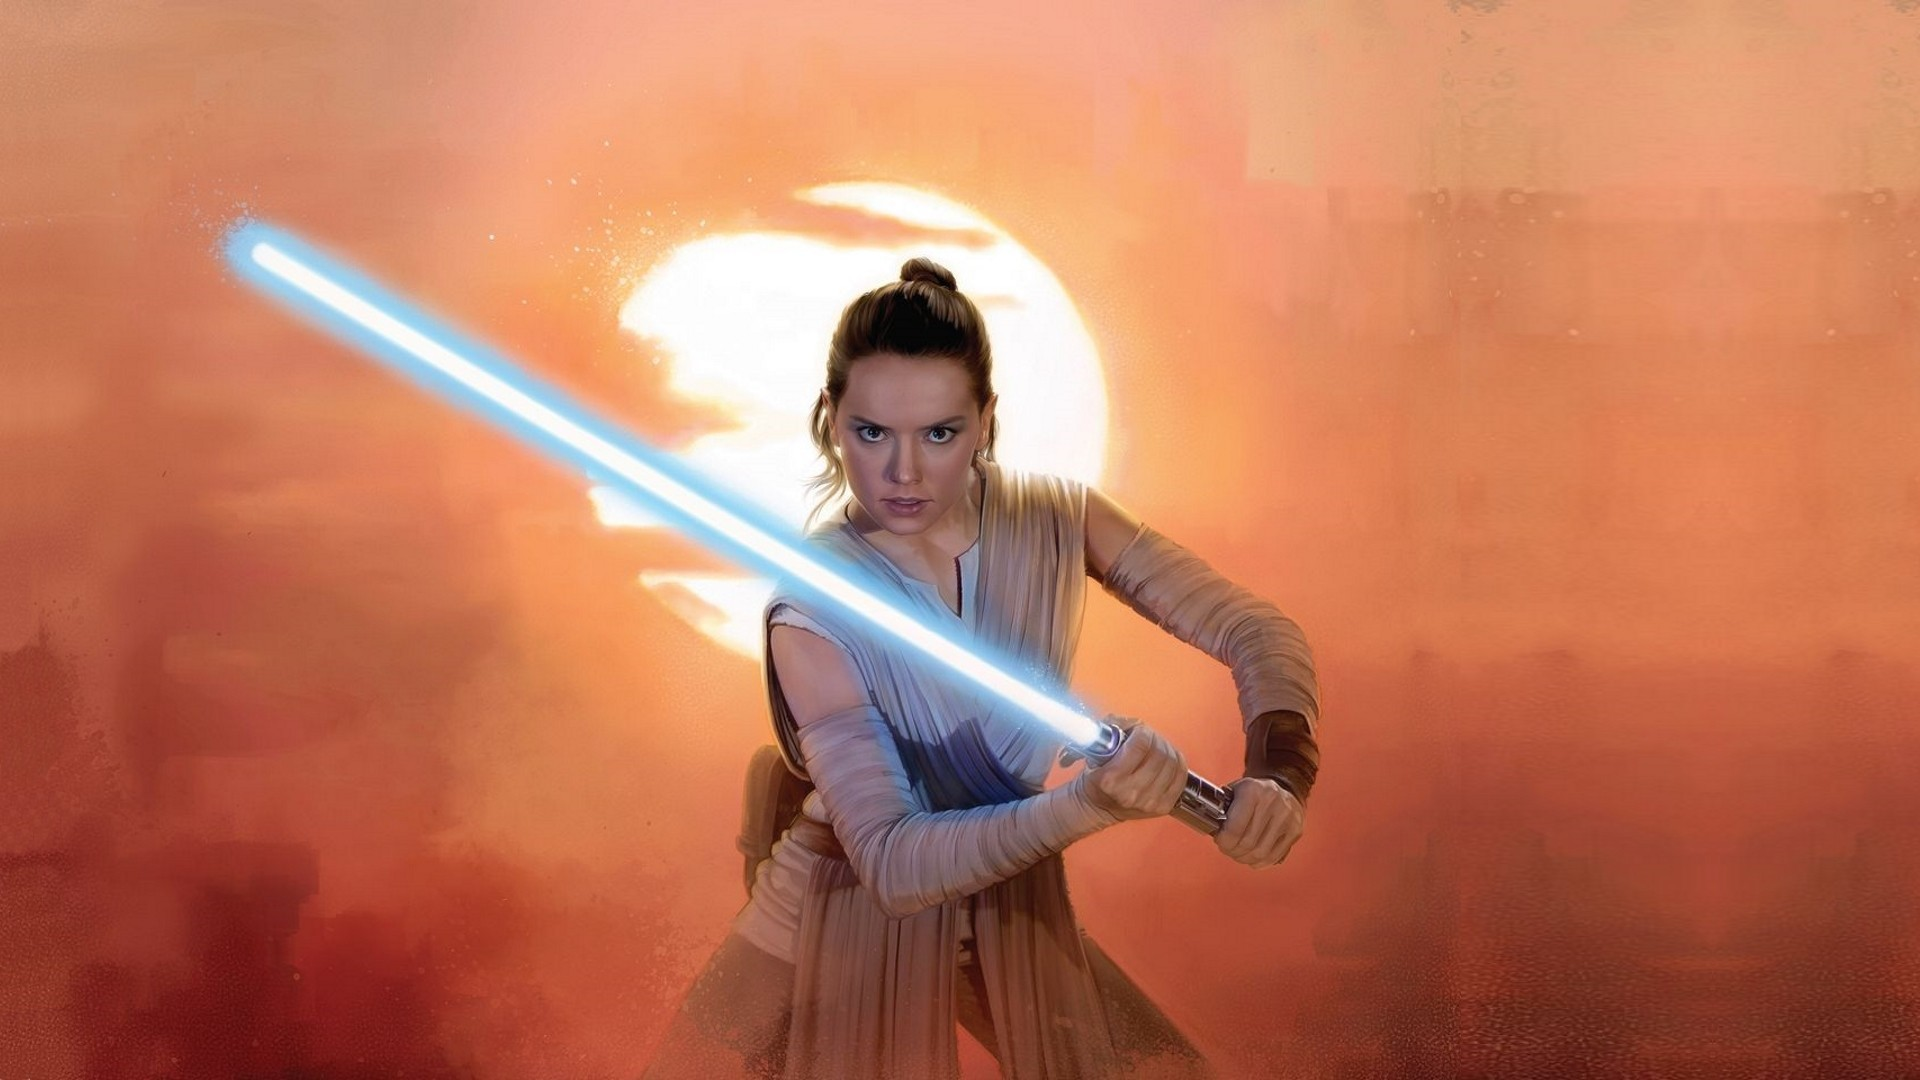 People Star Wars lightsaber Jedi Daisy Ridley Rey (from Star Wars)